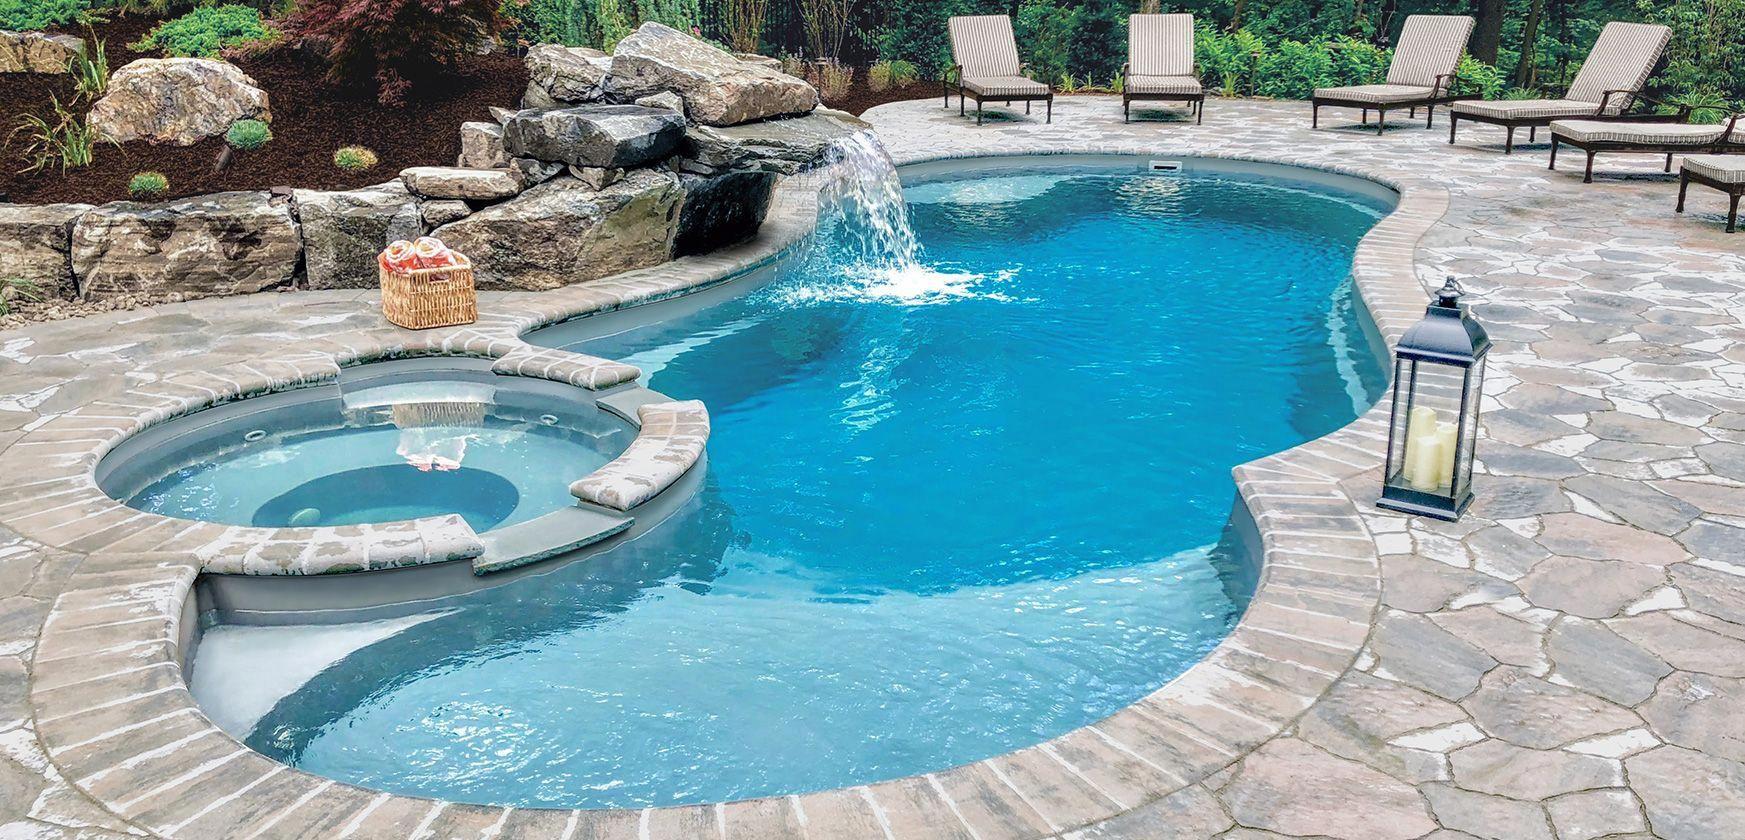 29 Spectacular Blueprints For Ingroundpool In 2020 Leisure Pools Fiberglass Swimming Pools Fiberglass Pools